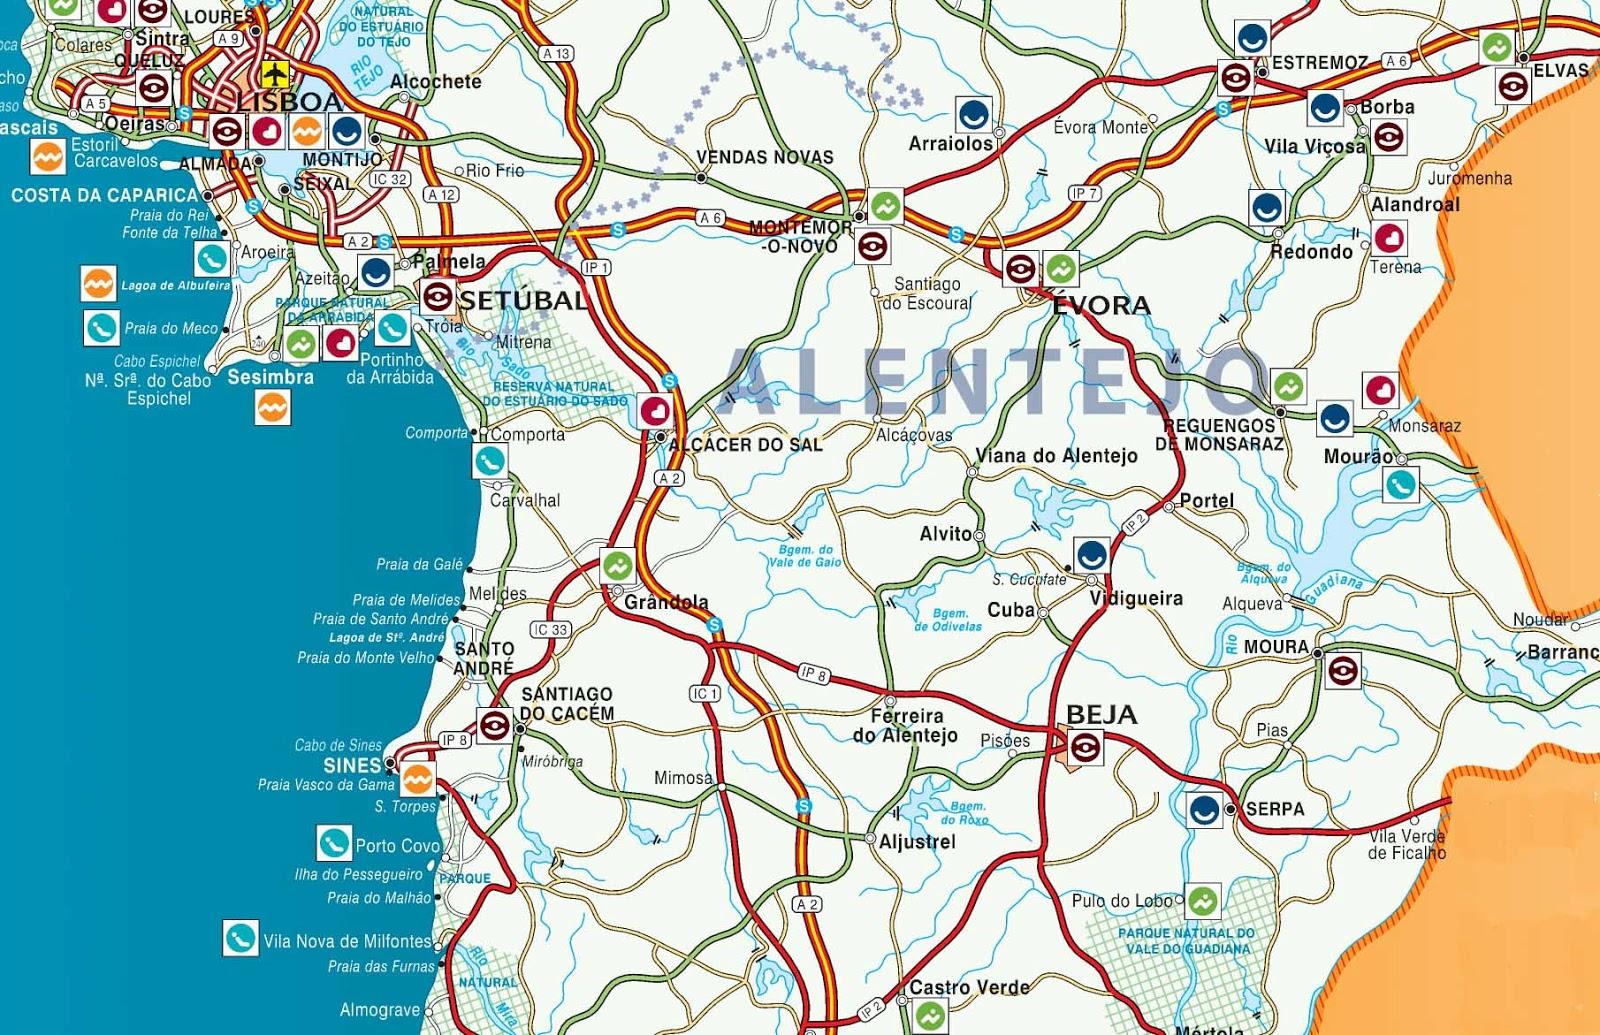 alentejo portugal mapa Mapas de Beja   Portugal | MapasBlog alentejo portugal mapa